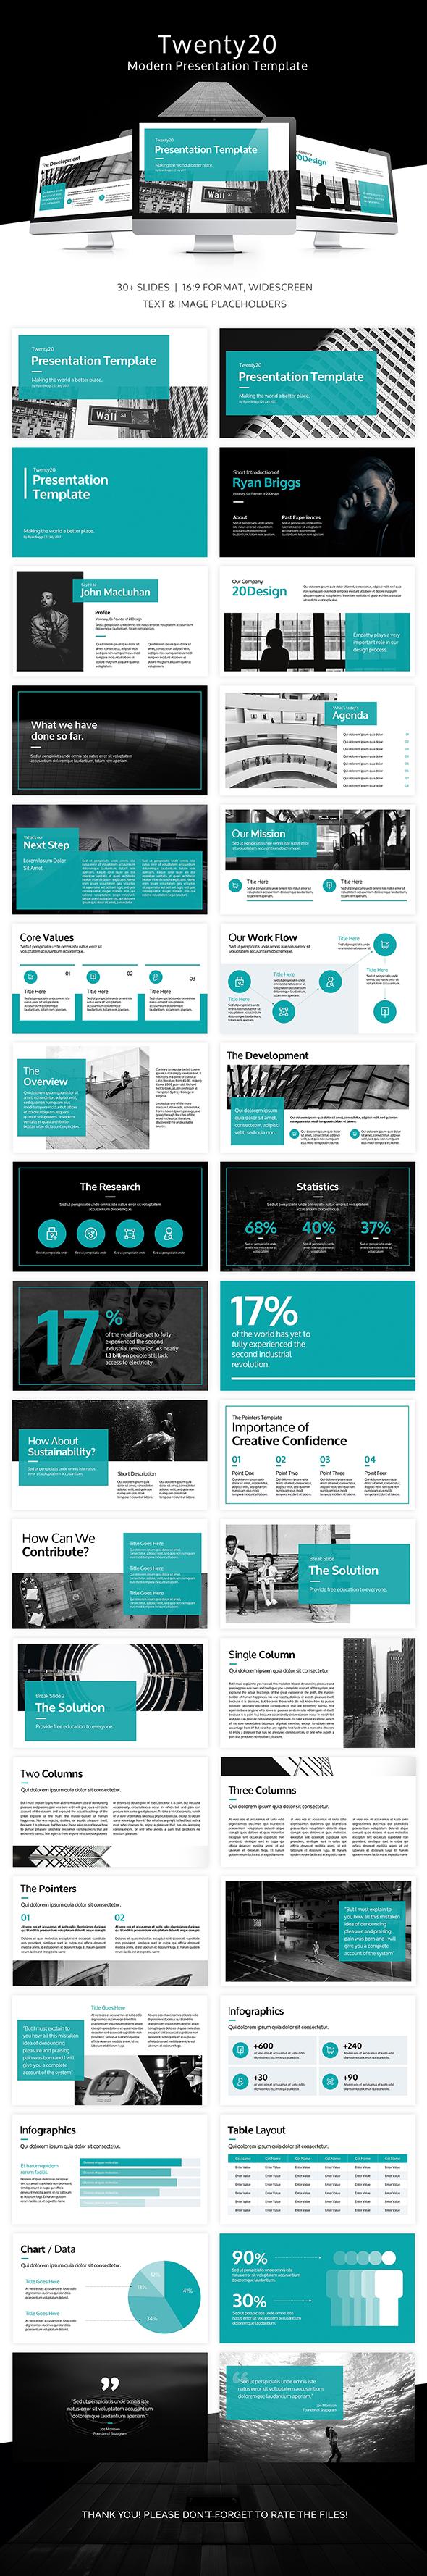 Twenty20 Powerpoint Presentation Slides - Presentation Templates